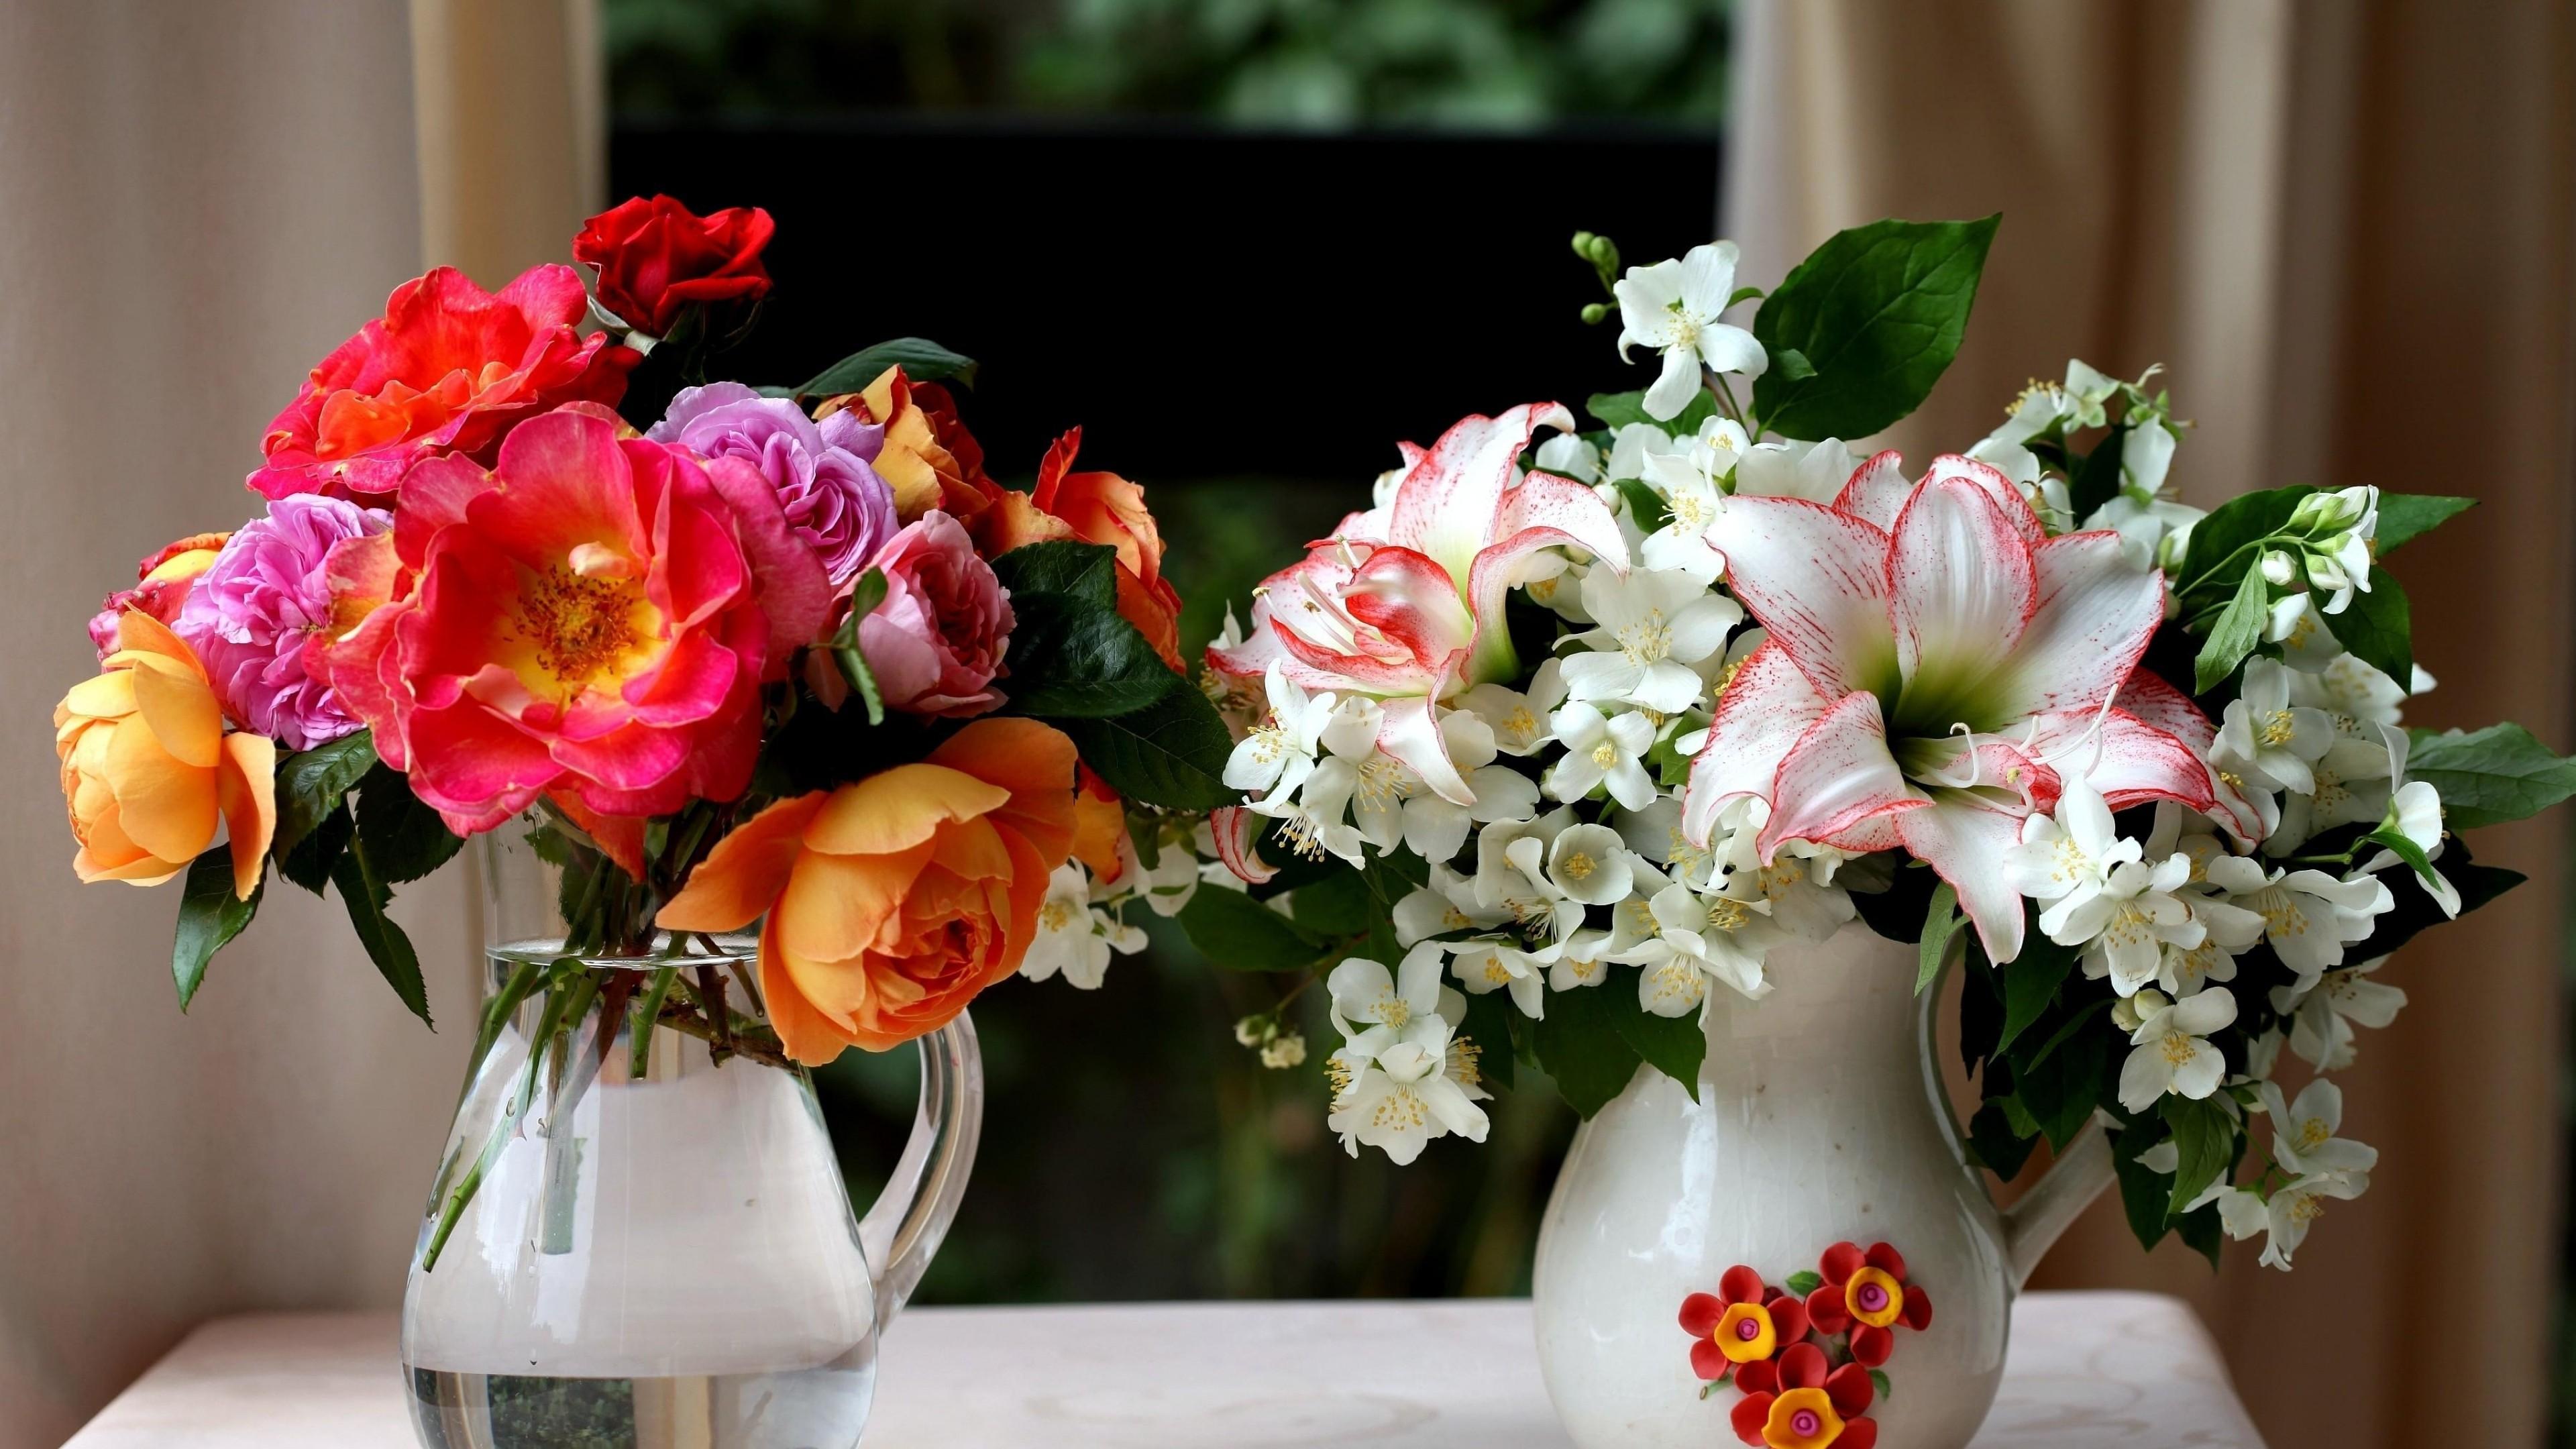 1920x1080 Fall Hd Wallpaper Jasmine Flower Wallpaper 183 ① Wallpapertag